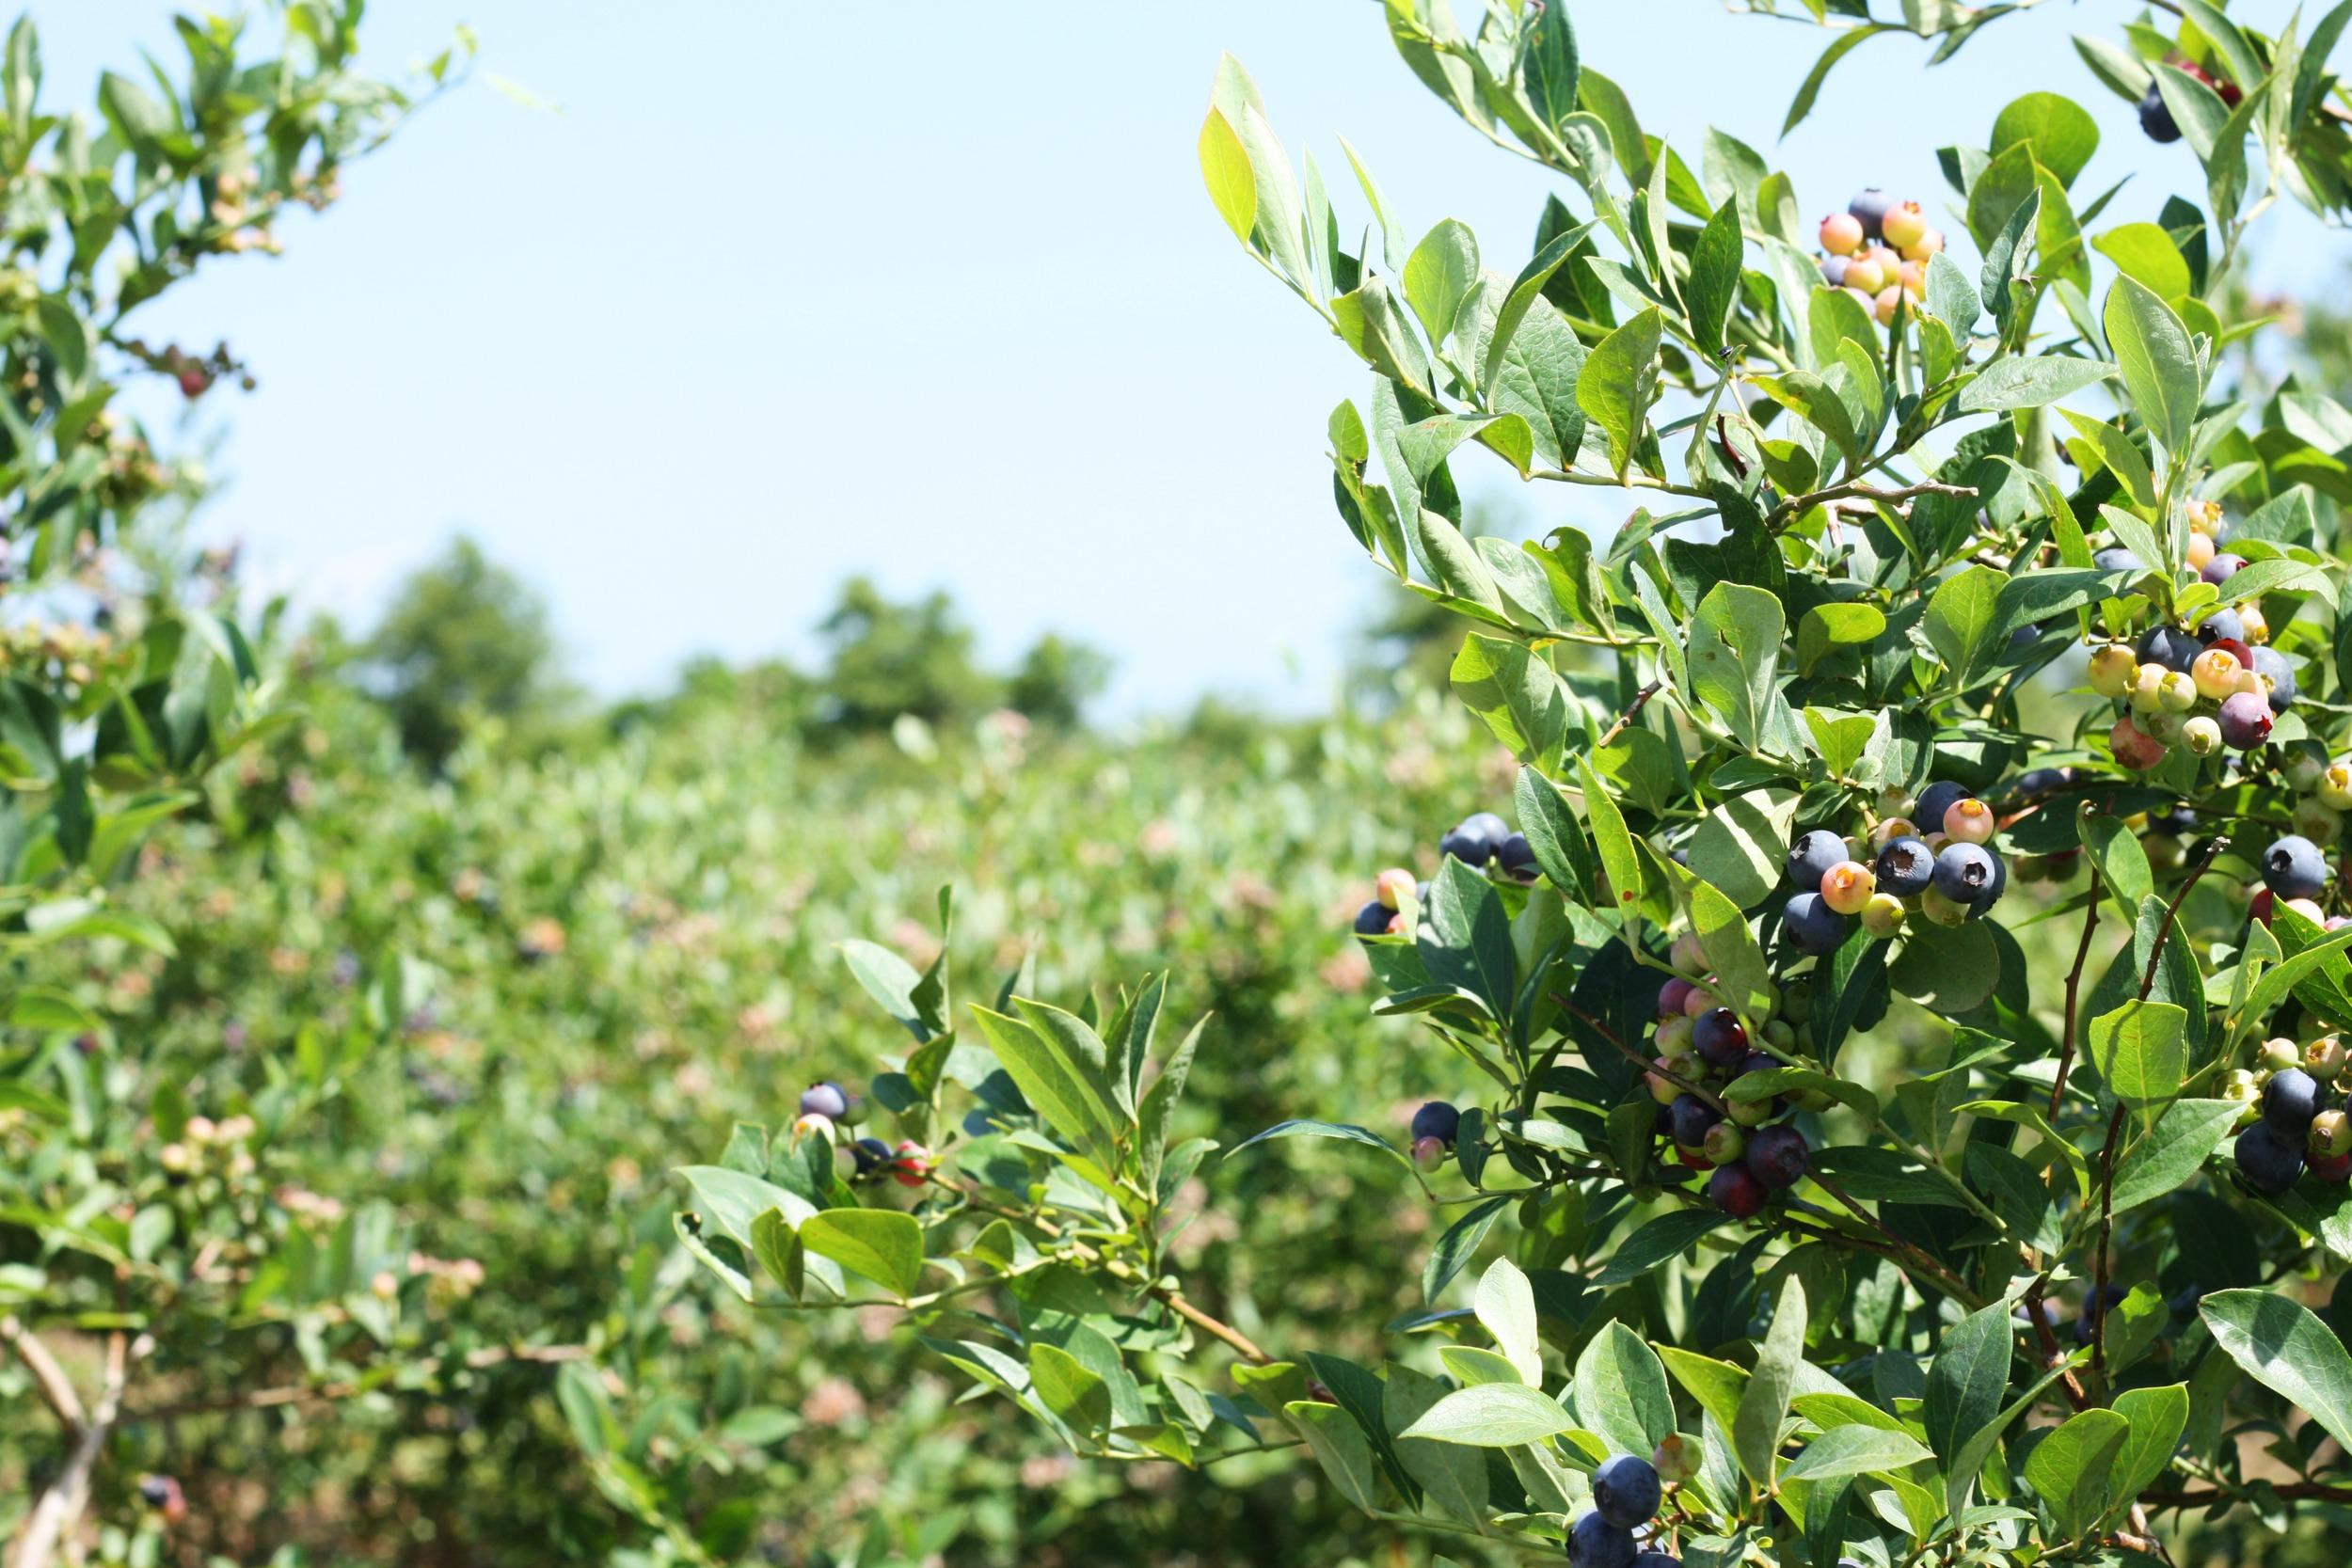 Blueberry Picking along the Gulf Coast: Blue Basket Farms, Milton, Florida